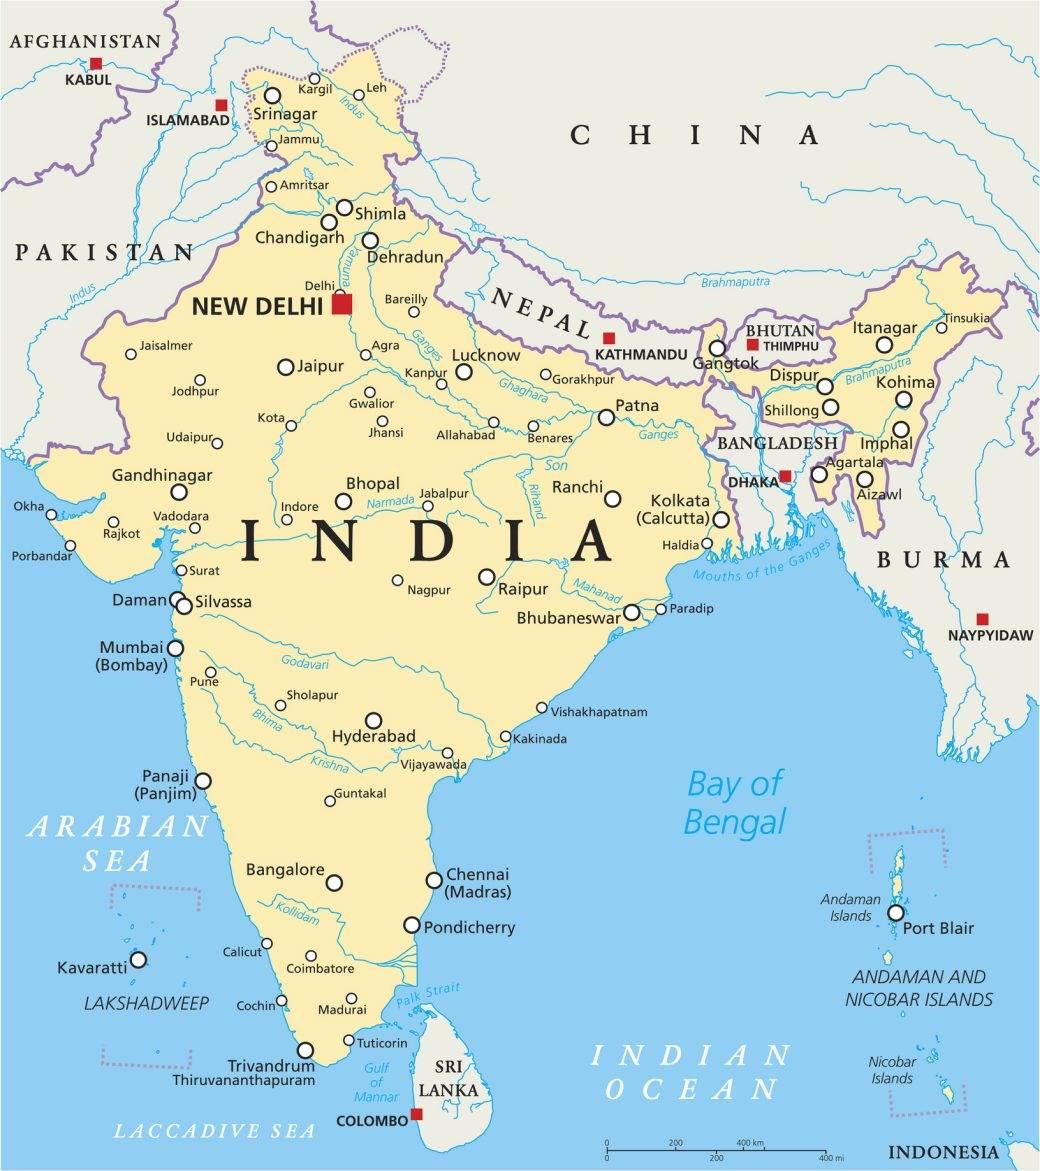 INDIJA.jpg